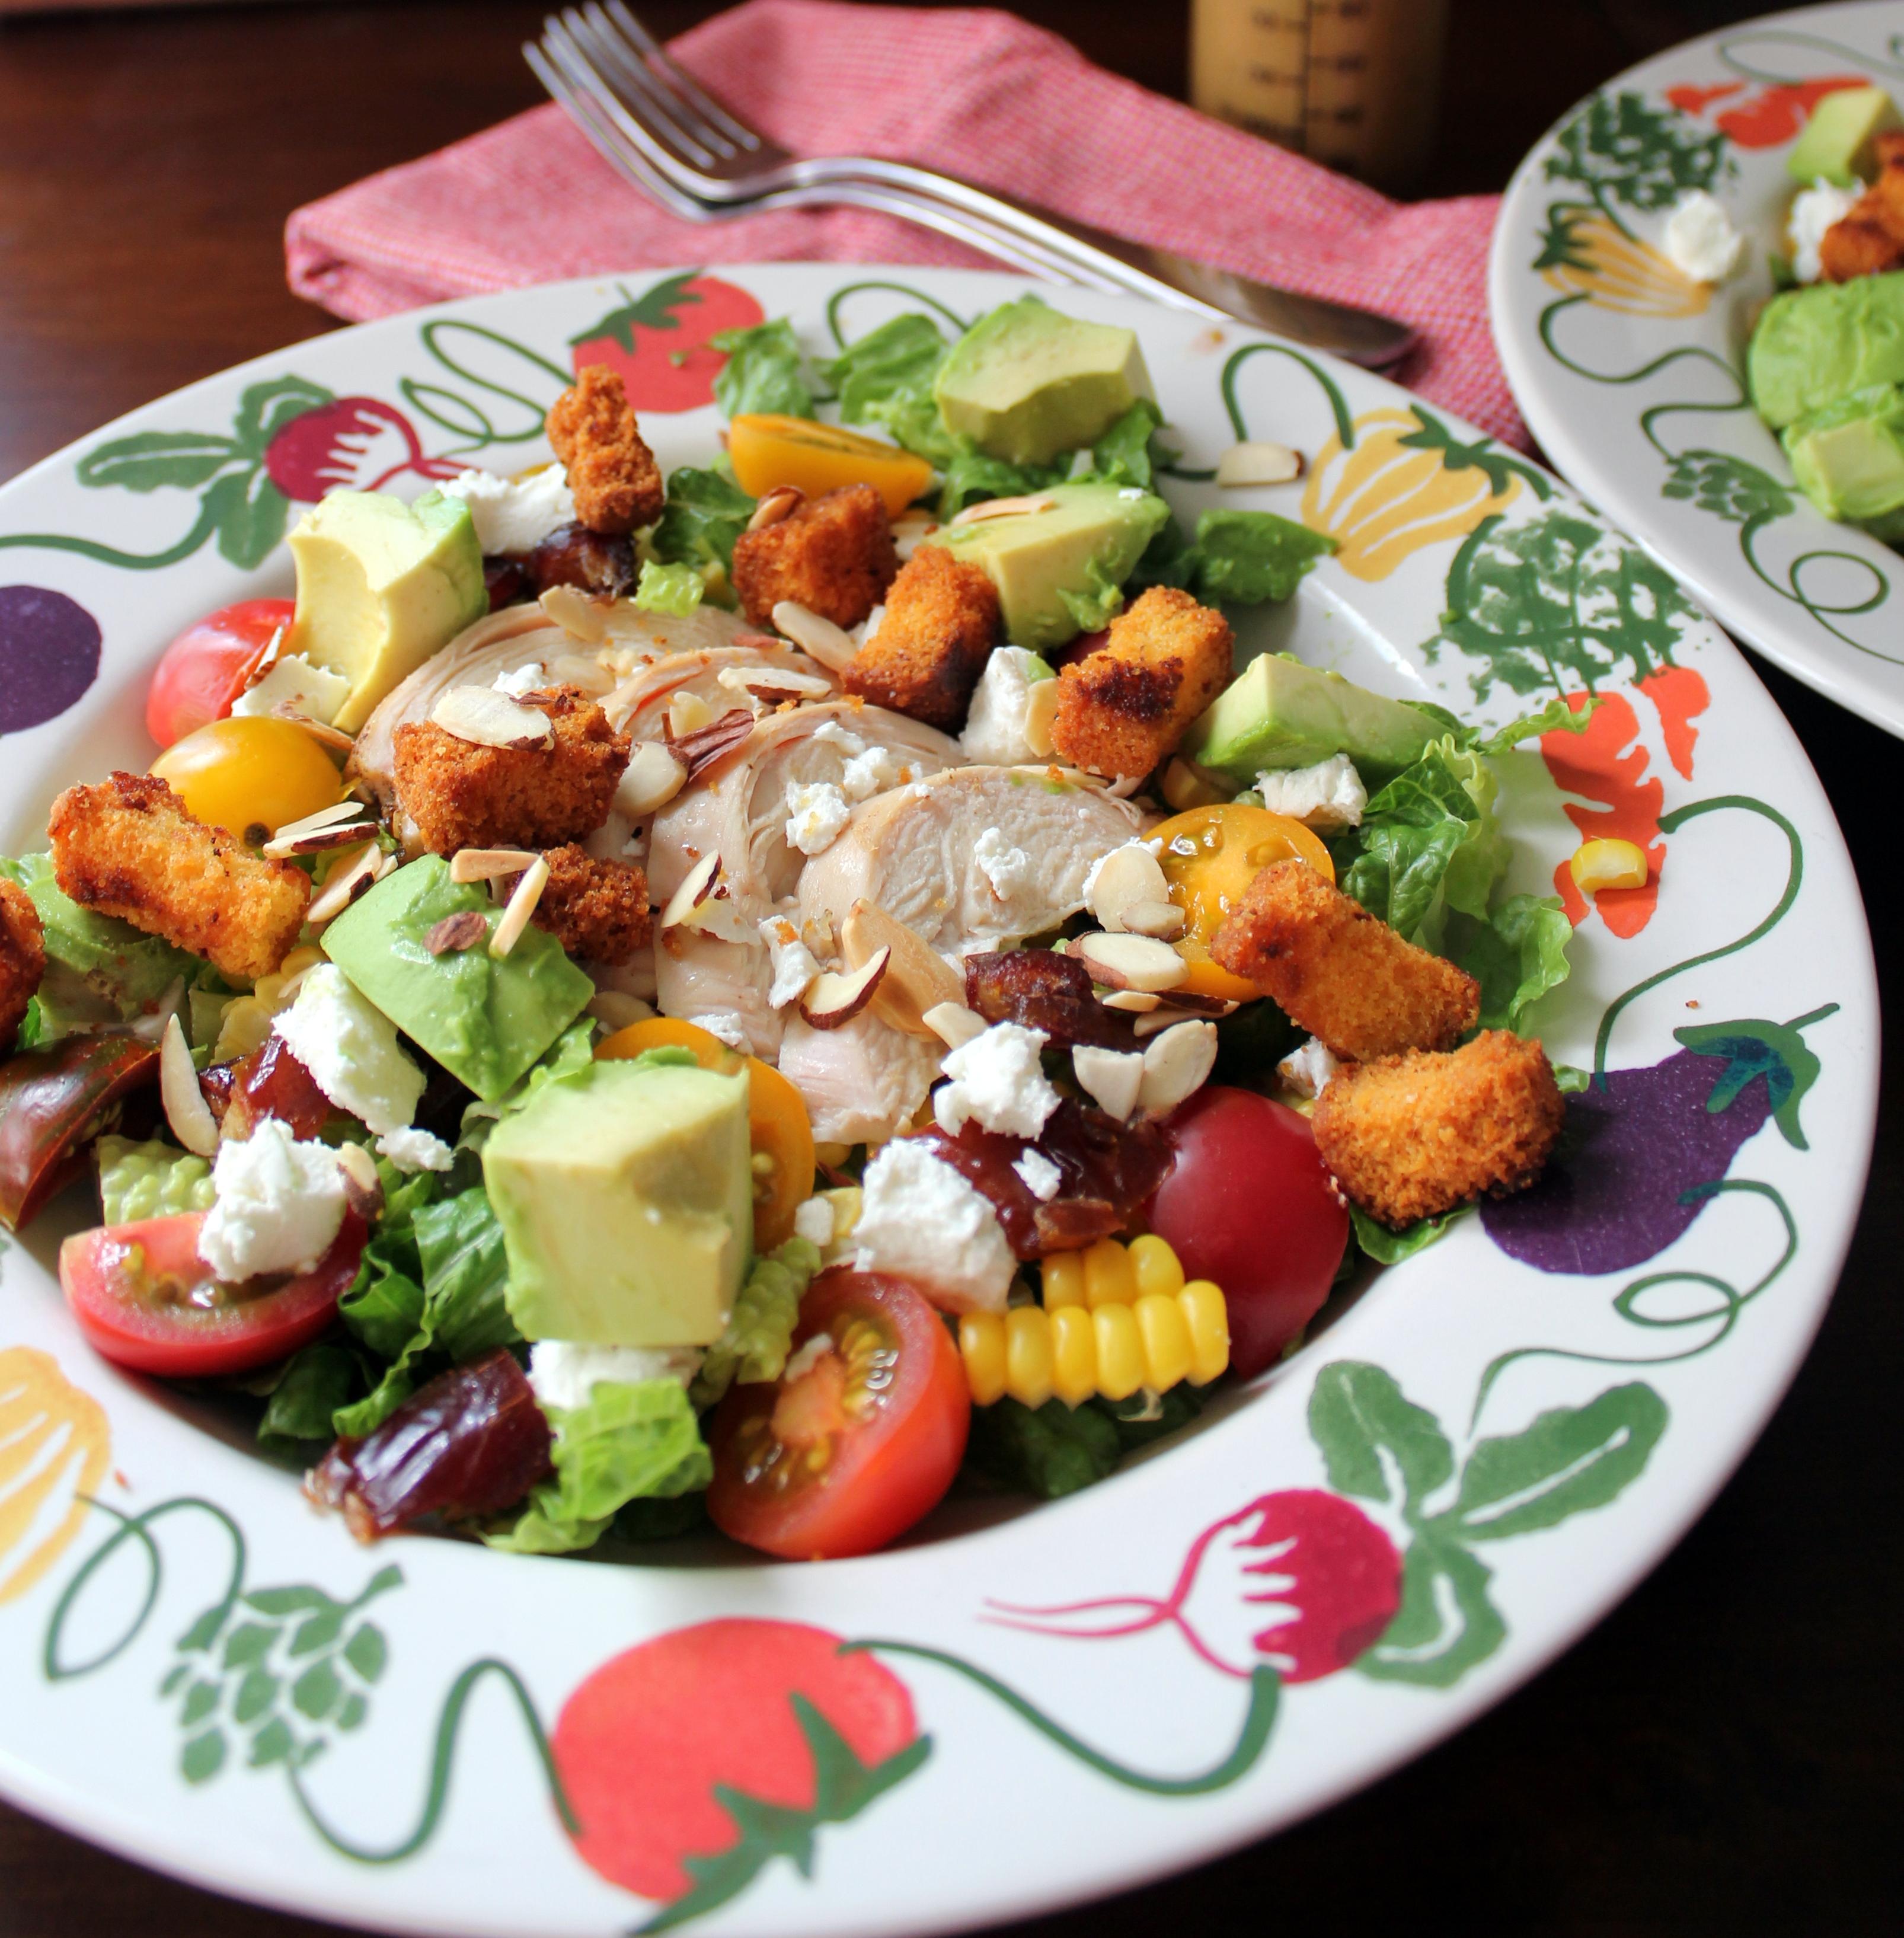 Bandera's macho salad